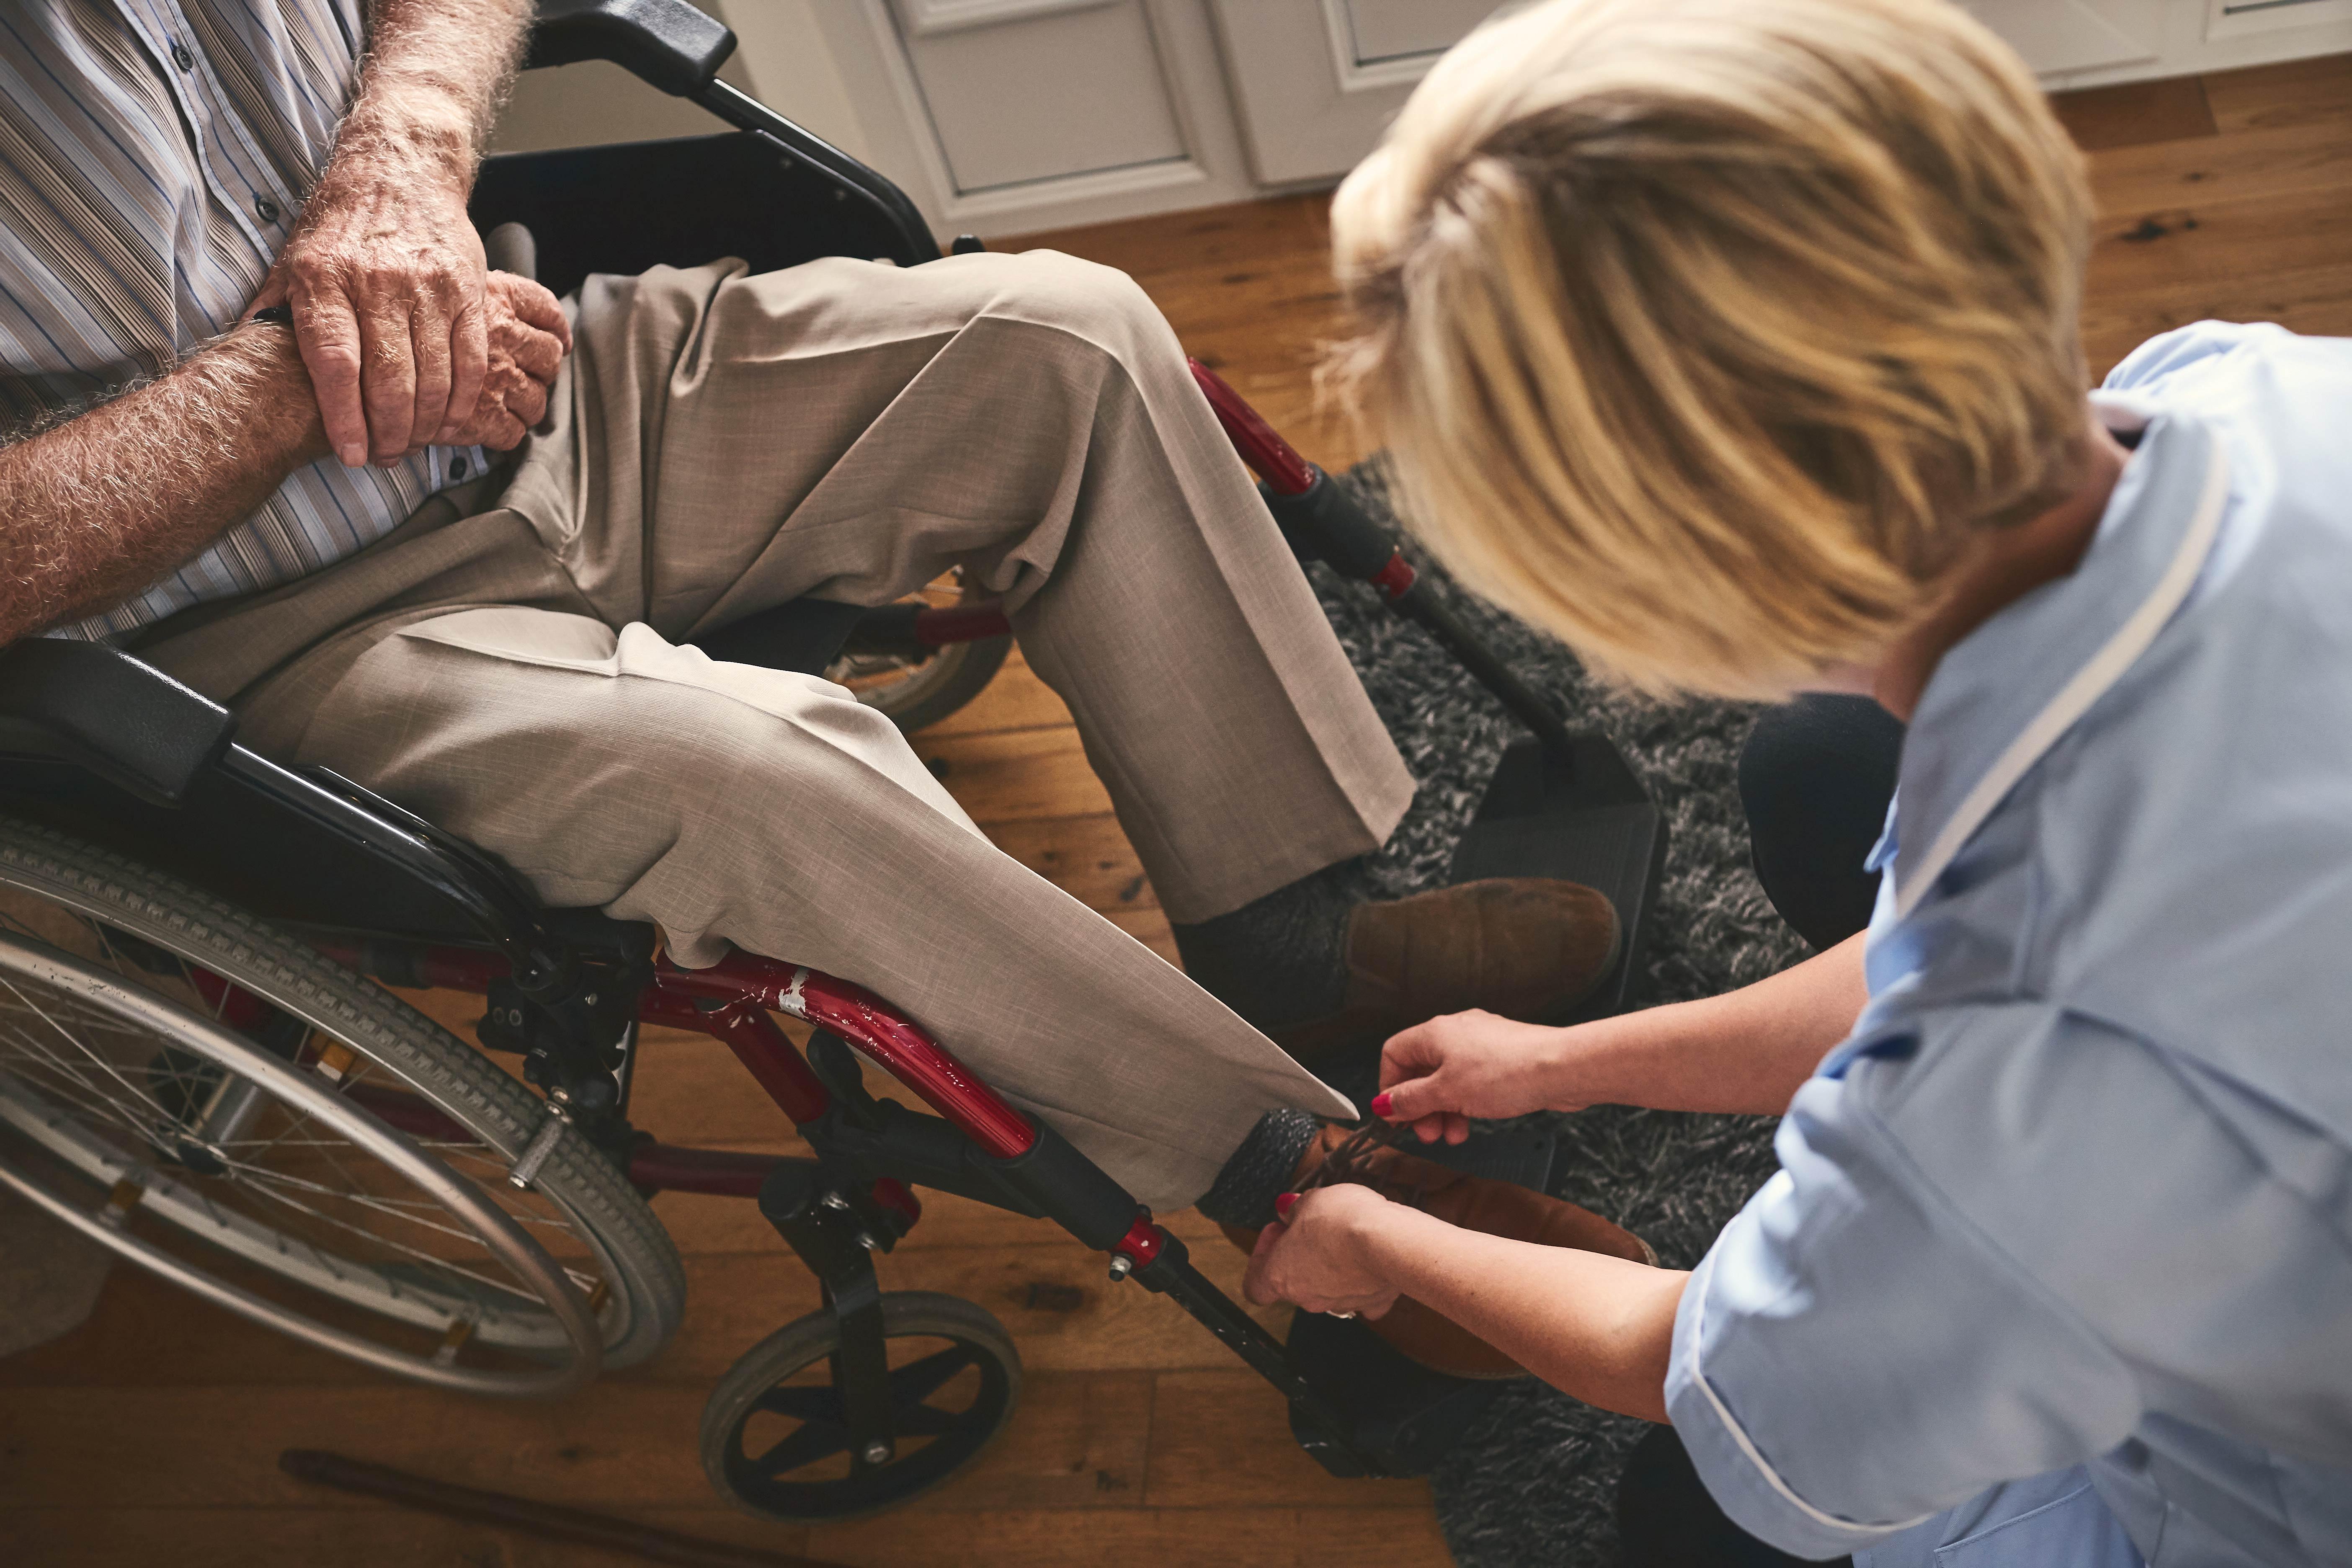 caregiver putting on adaptive footwear